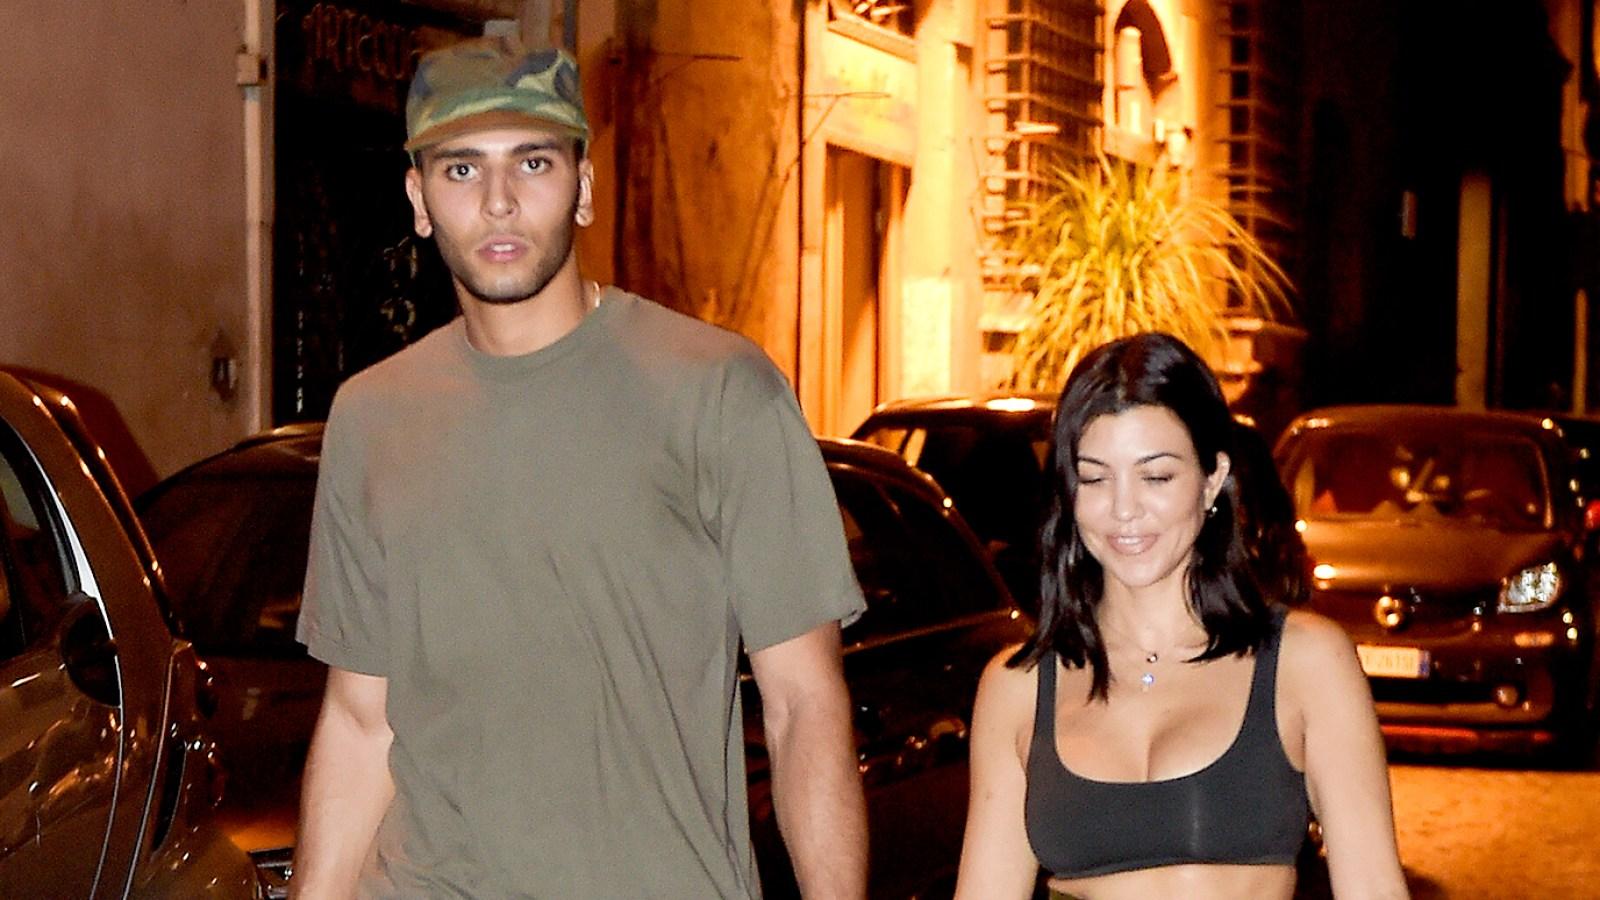 43bca57fcd2 Kourtney Kardashian s BF Younes Bendjima s Comment Was a  Joke